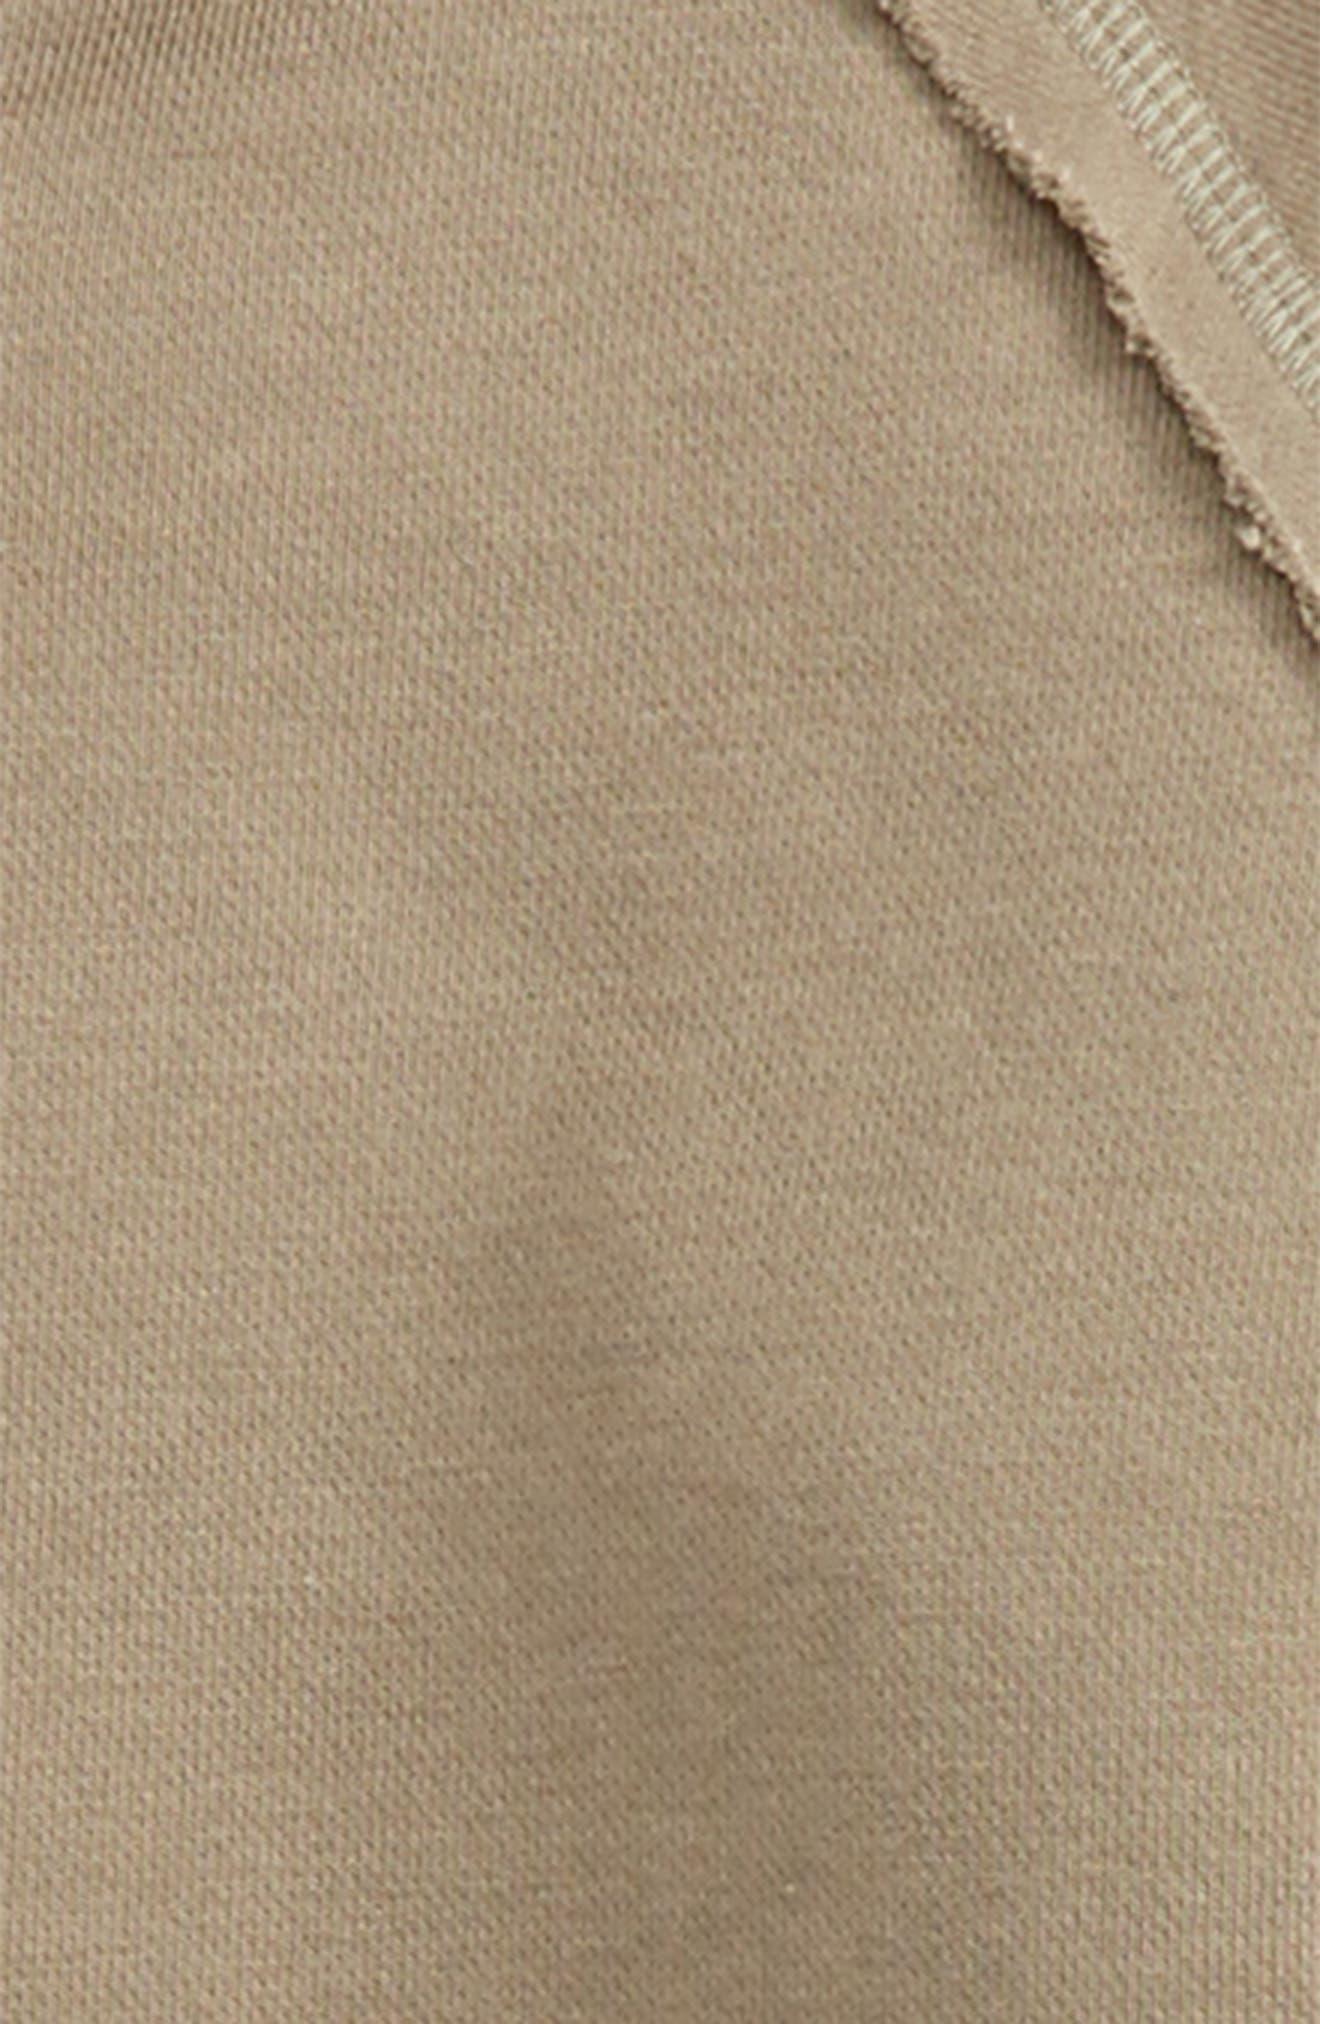 Alternate Image 2  - Superism Raglan Sleeve Sweatshirt (Toddler Boys & Little Boys)